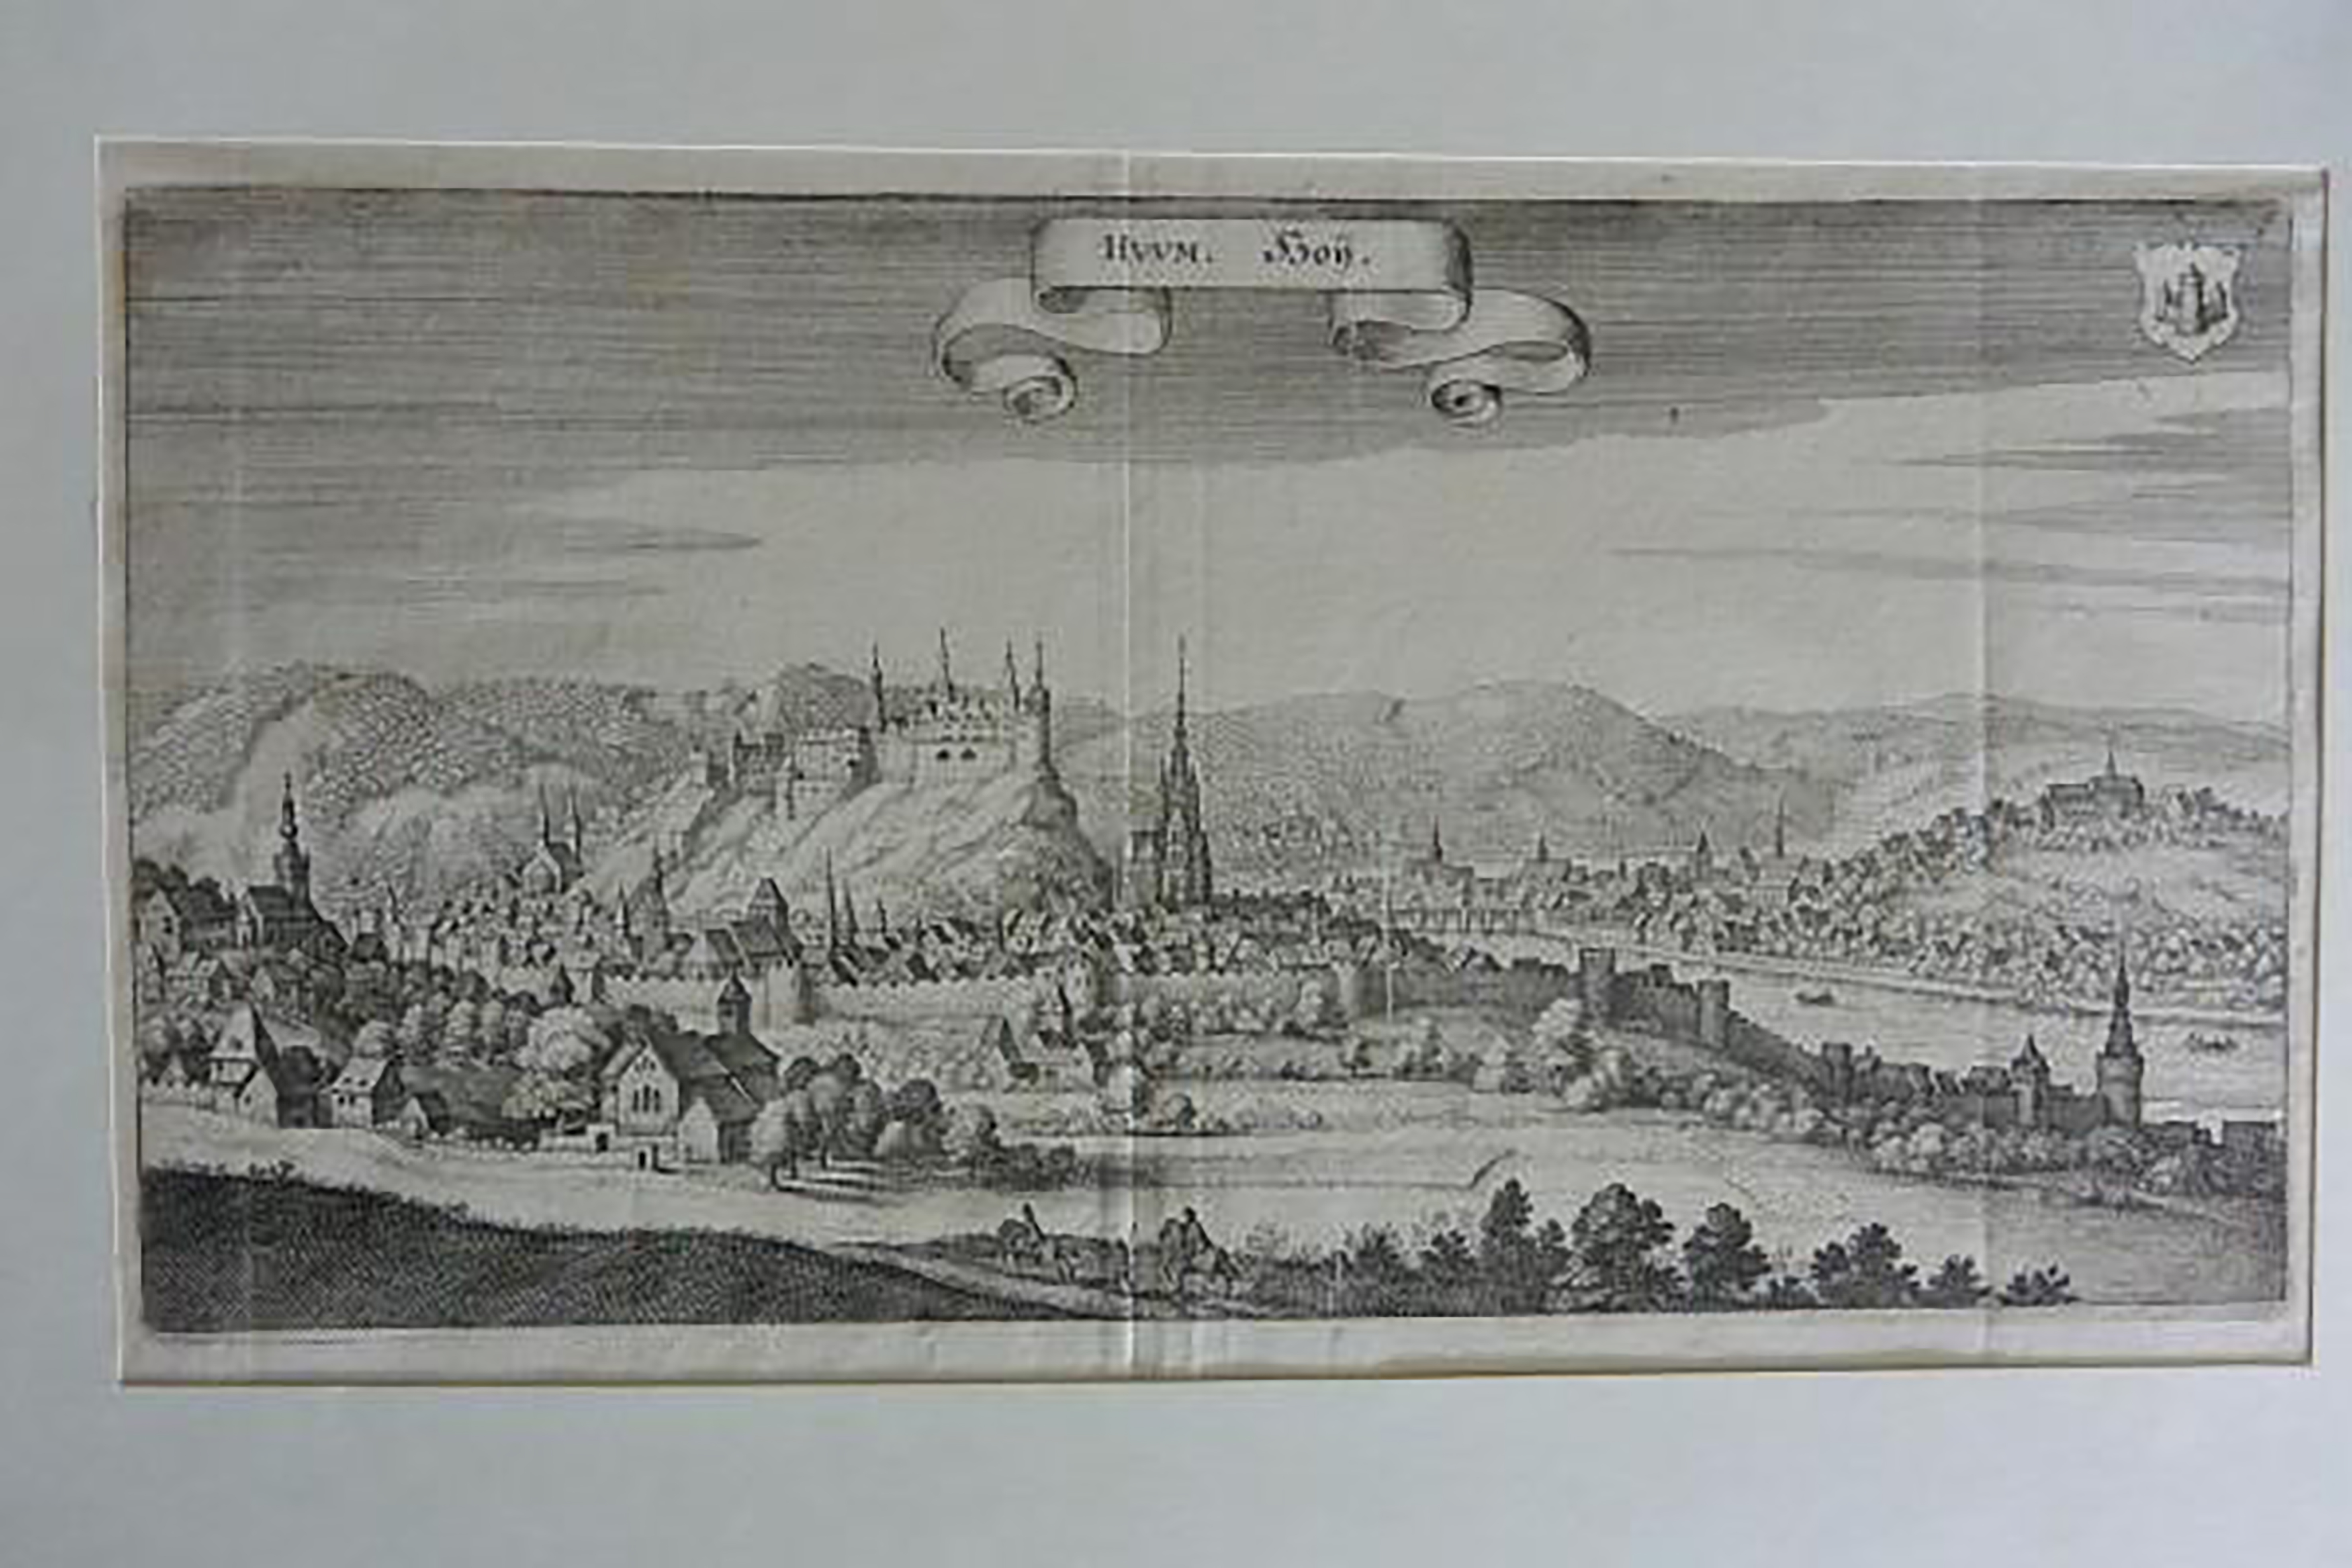 HUUM. Hoij) Huy ,Original-Kupferstich aus: Topographia Westphaliae.,: Merian, Matthäus